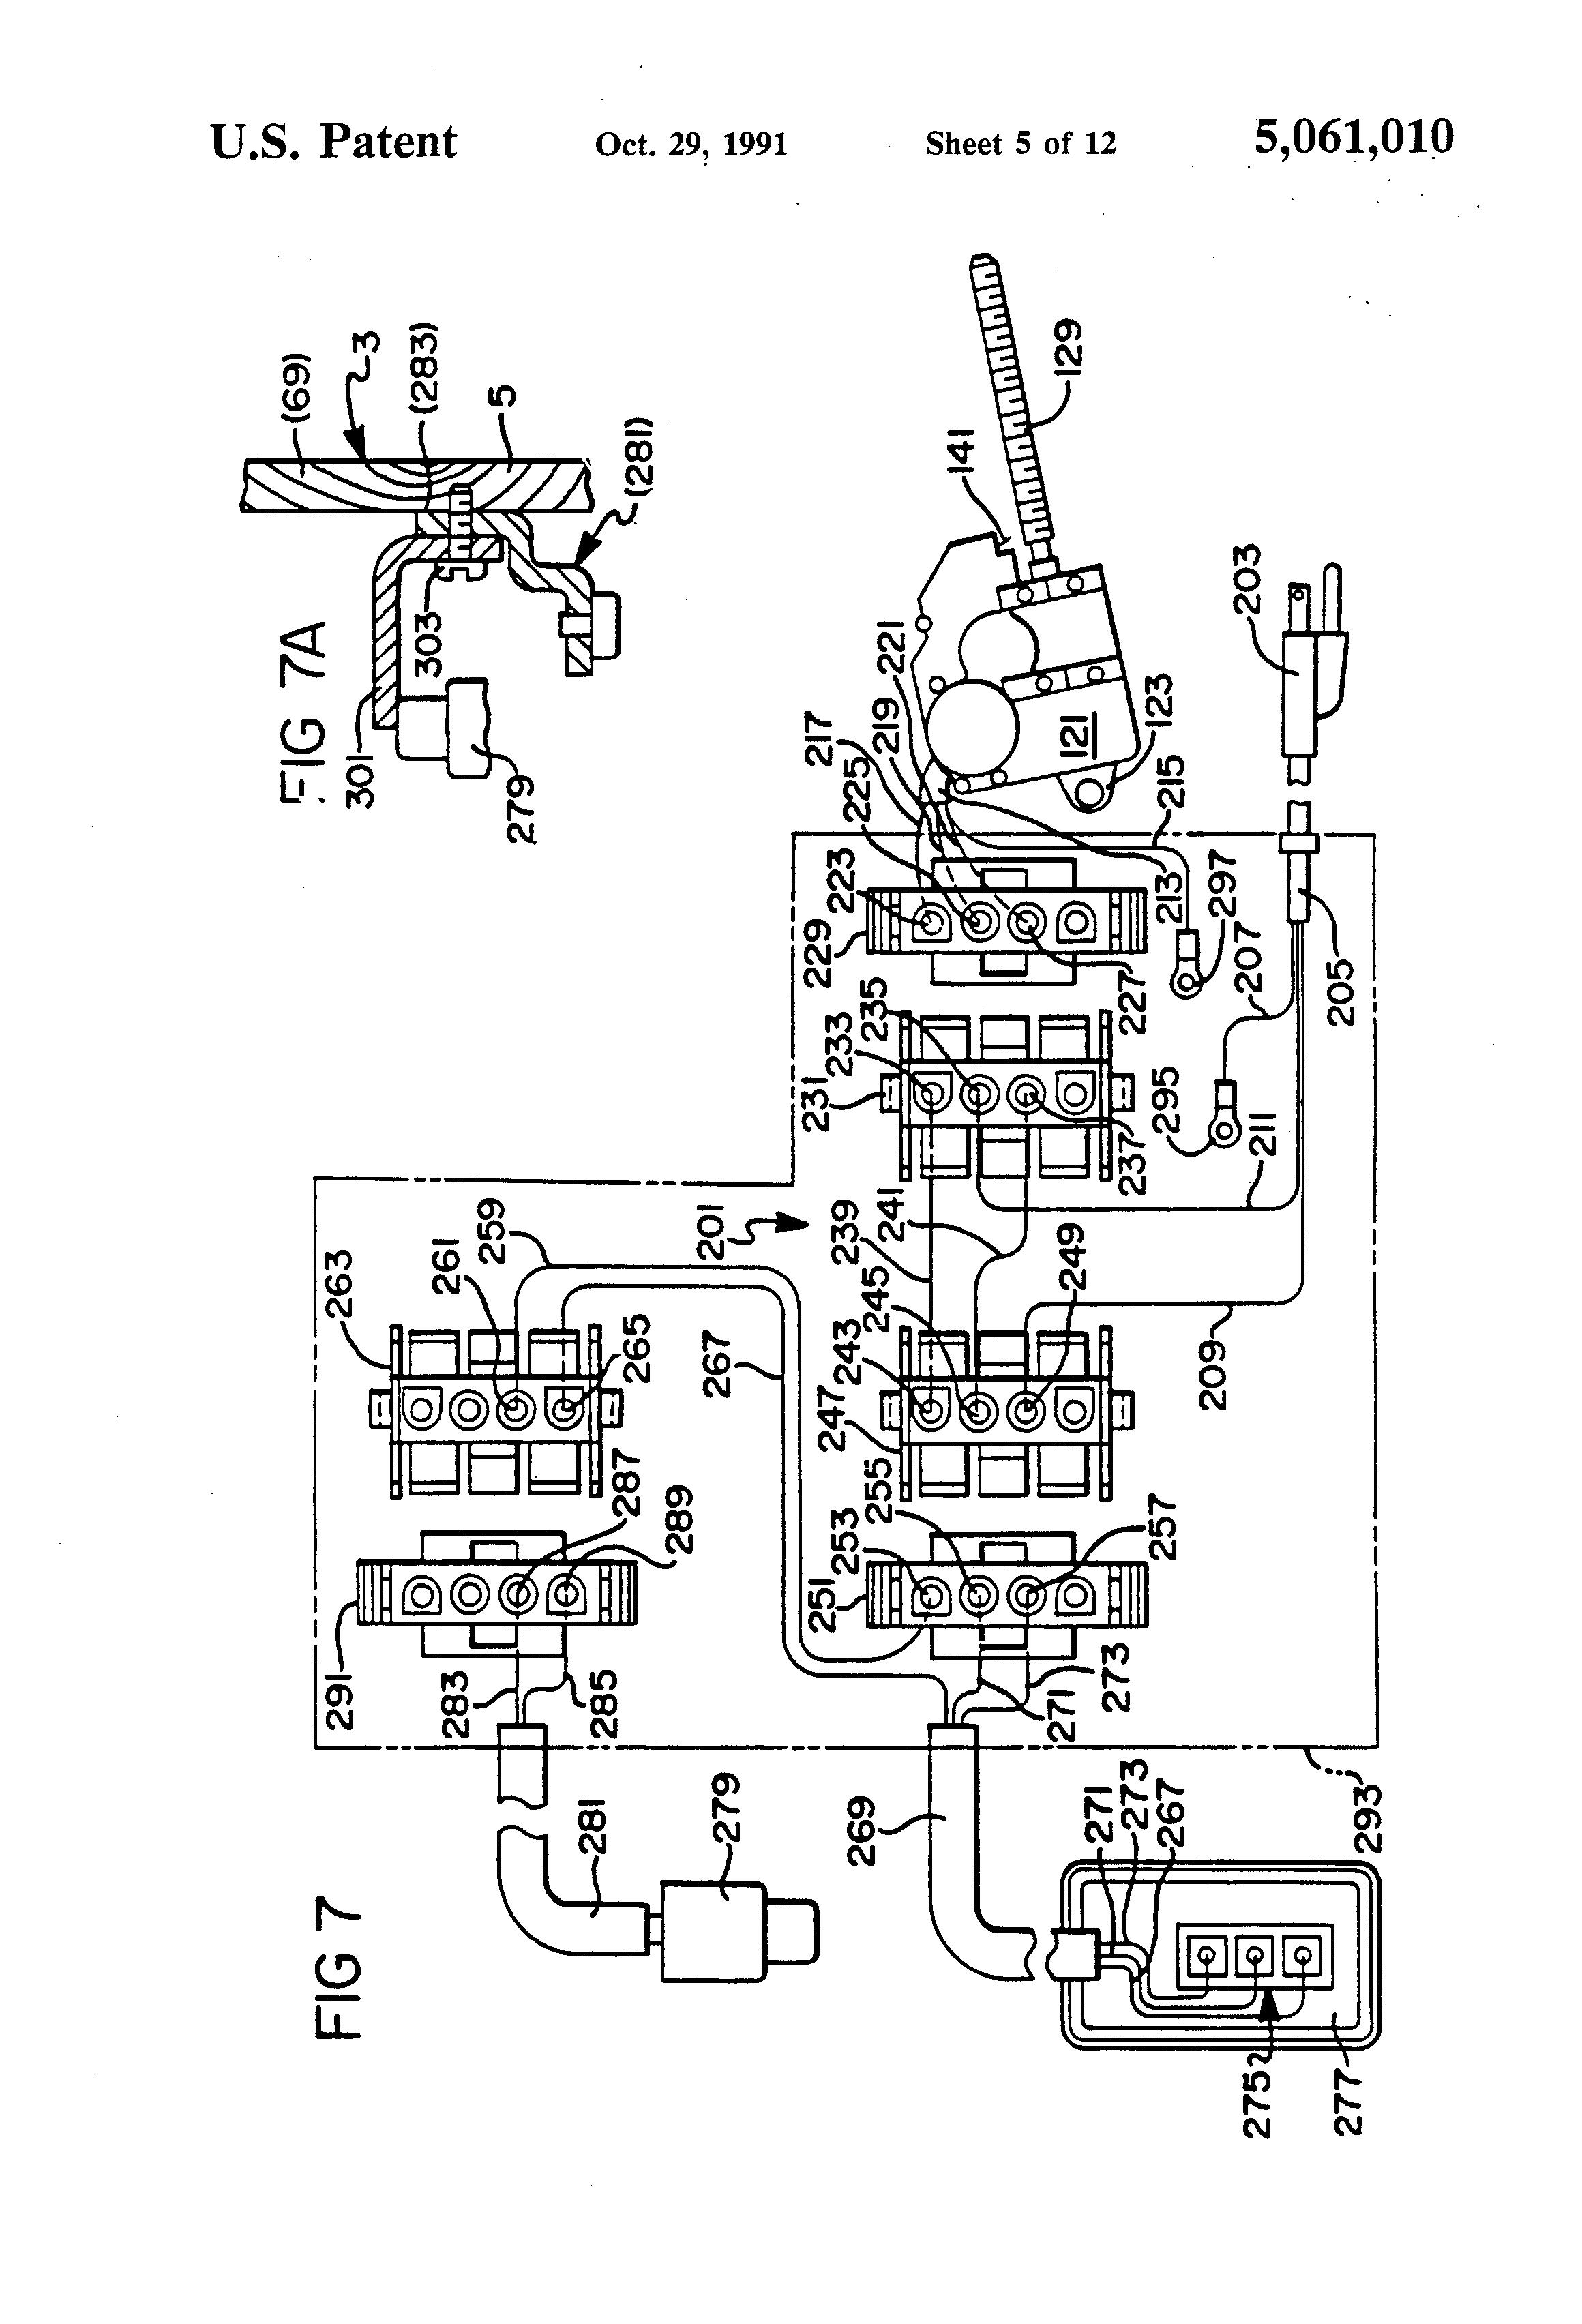 Hc Gt3 Recliner Remote Wiring Diagram